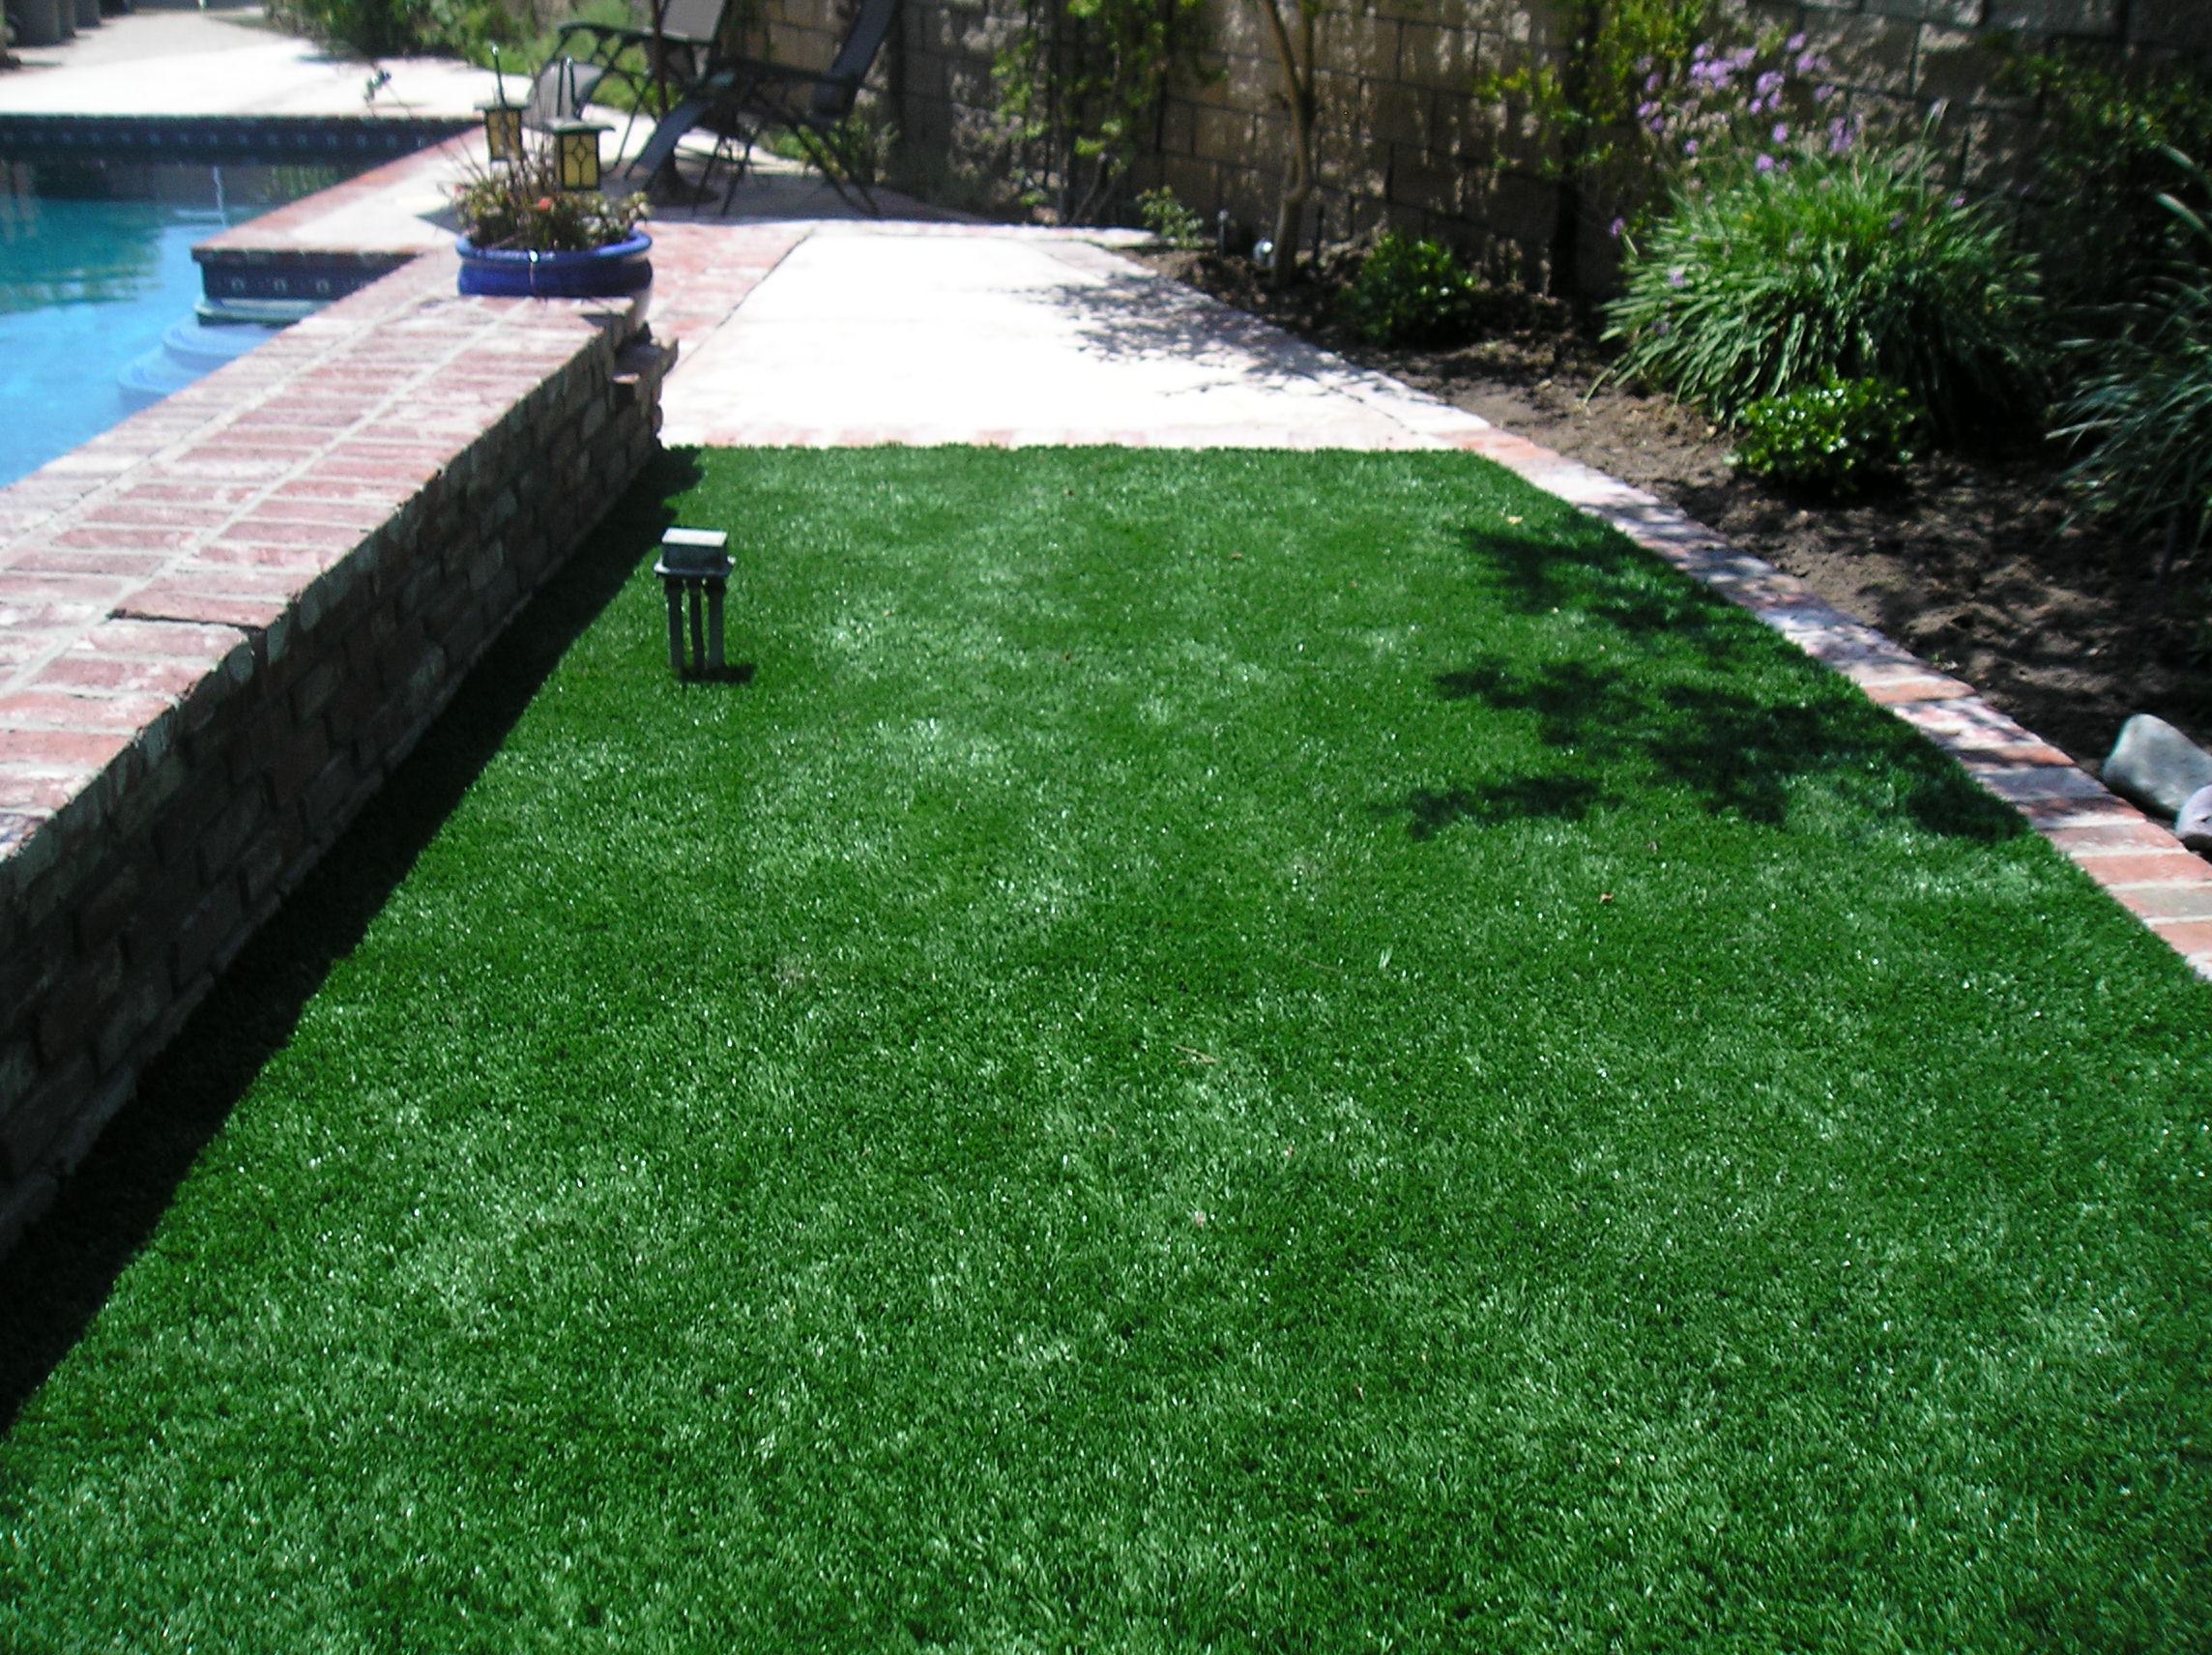 Riviera Monterey-50 fake grass for yard,backyard turf,turf backyard,turf yard,fake grass for backyard,artificial turf,synthetic turf,artificial turf installation,how to install artificial turf,used artificial turf